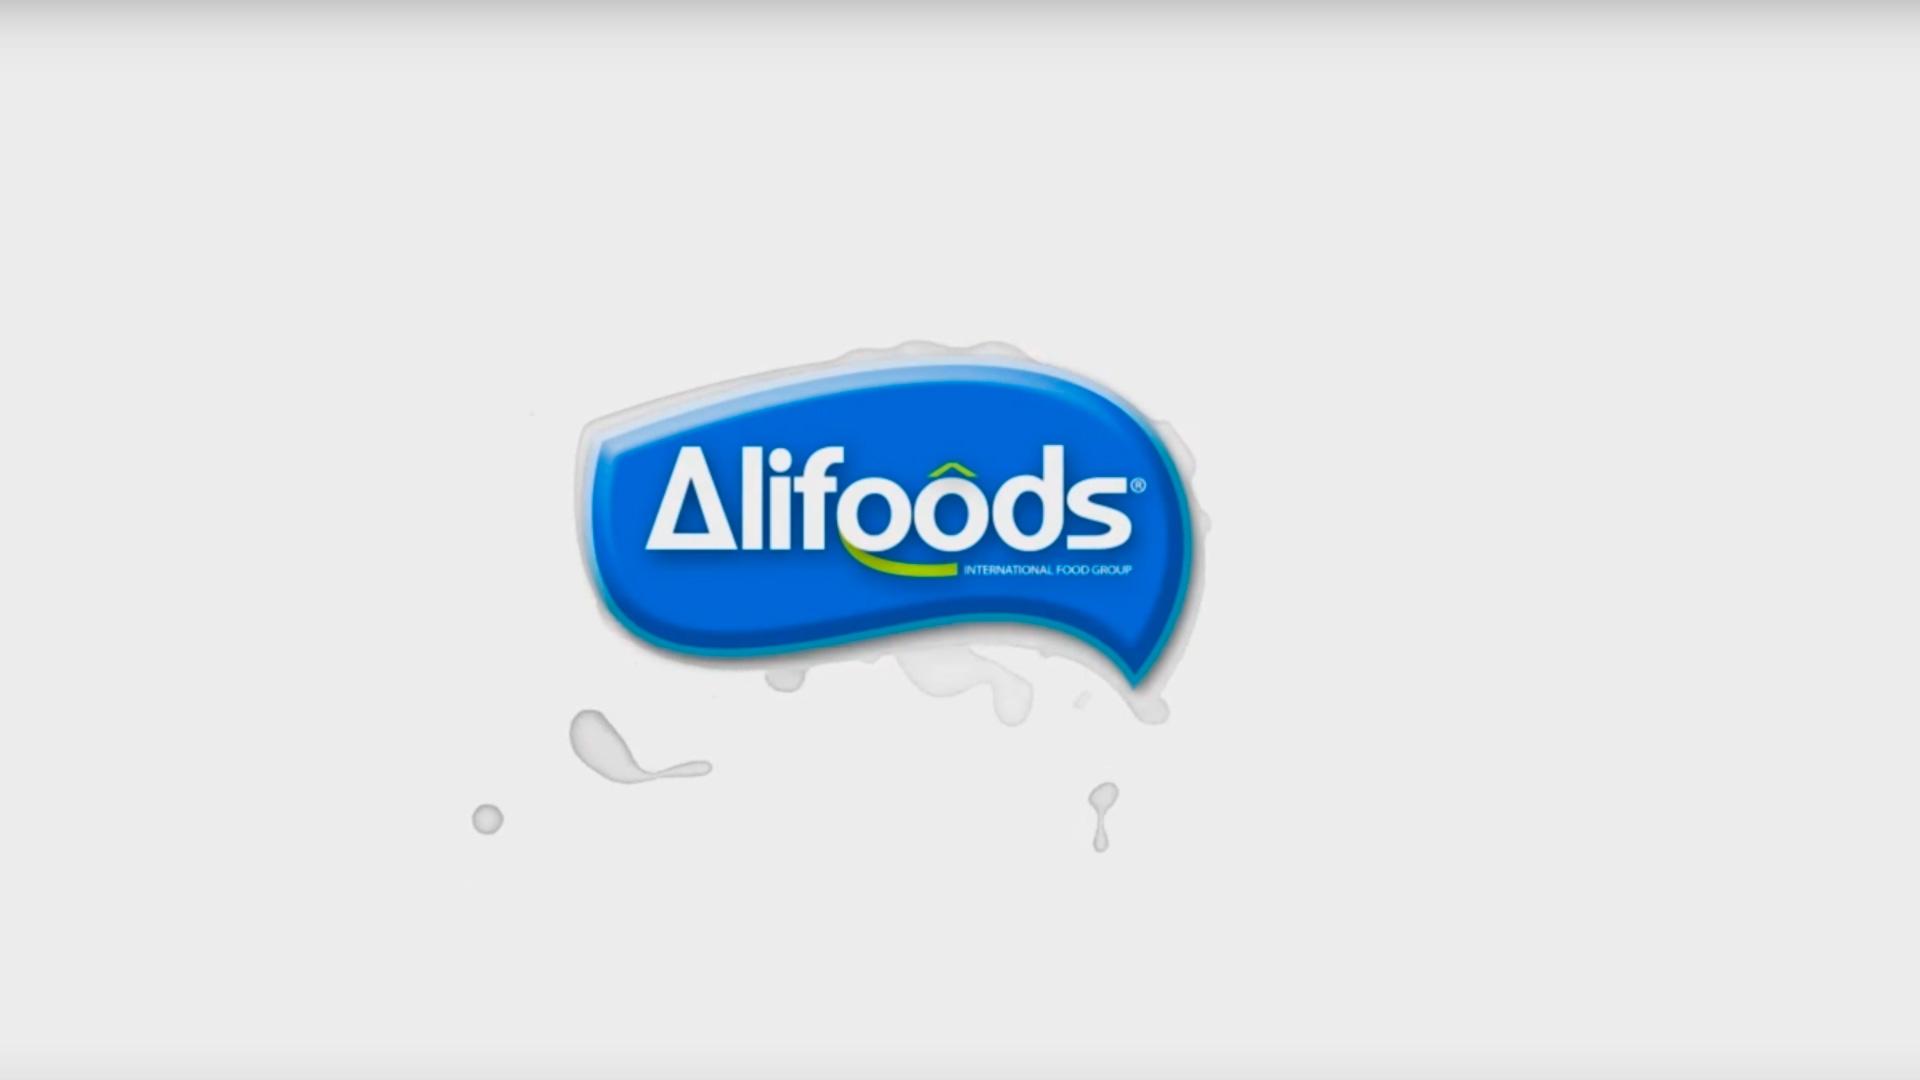 Alifoods